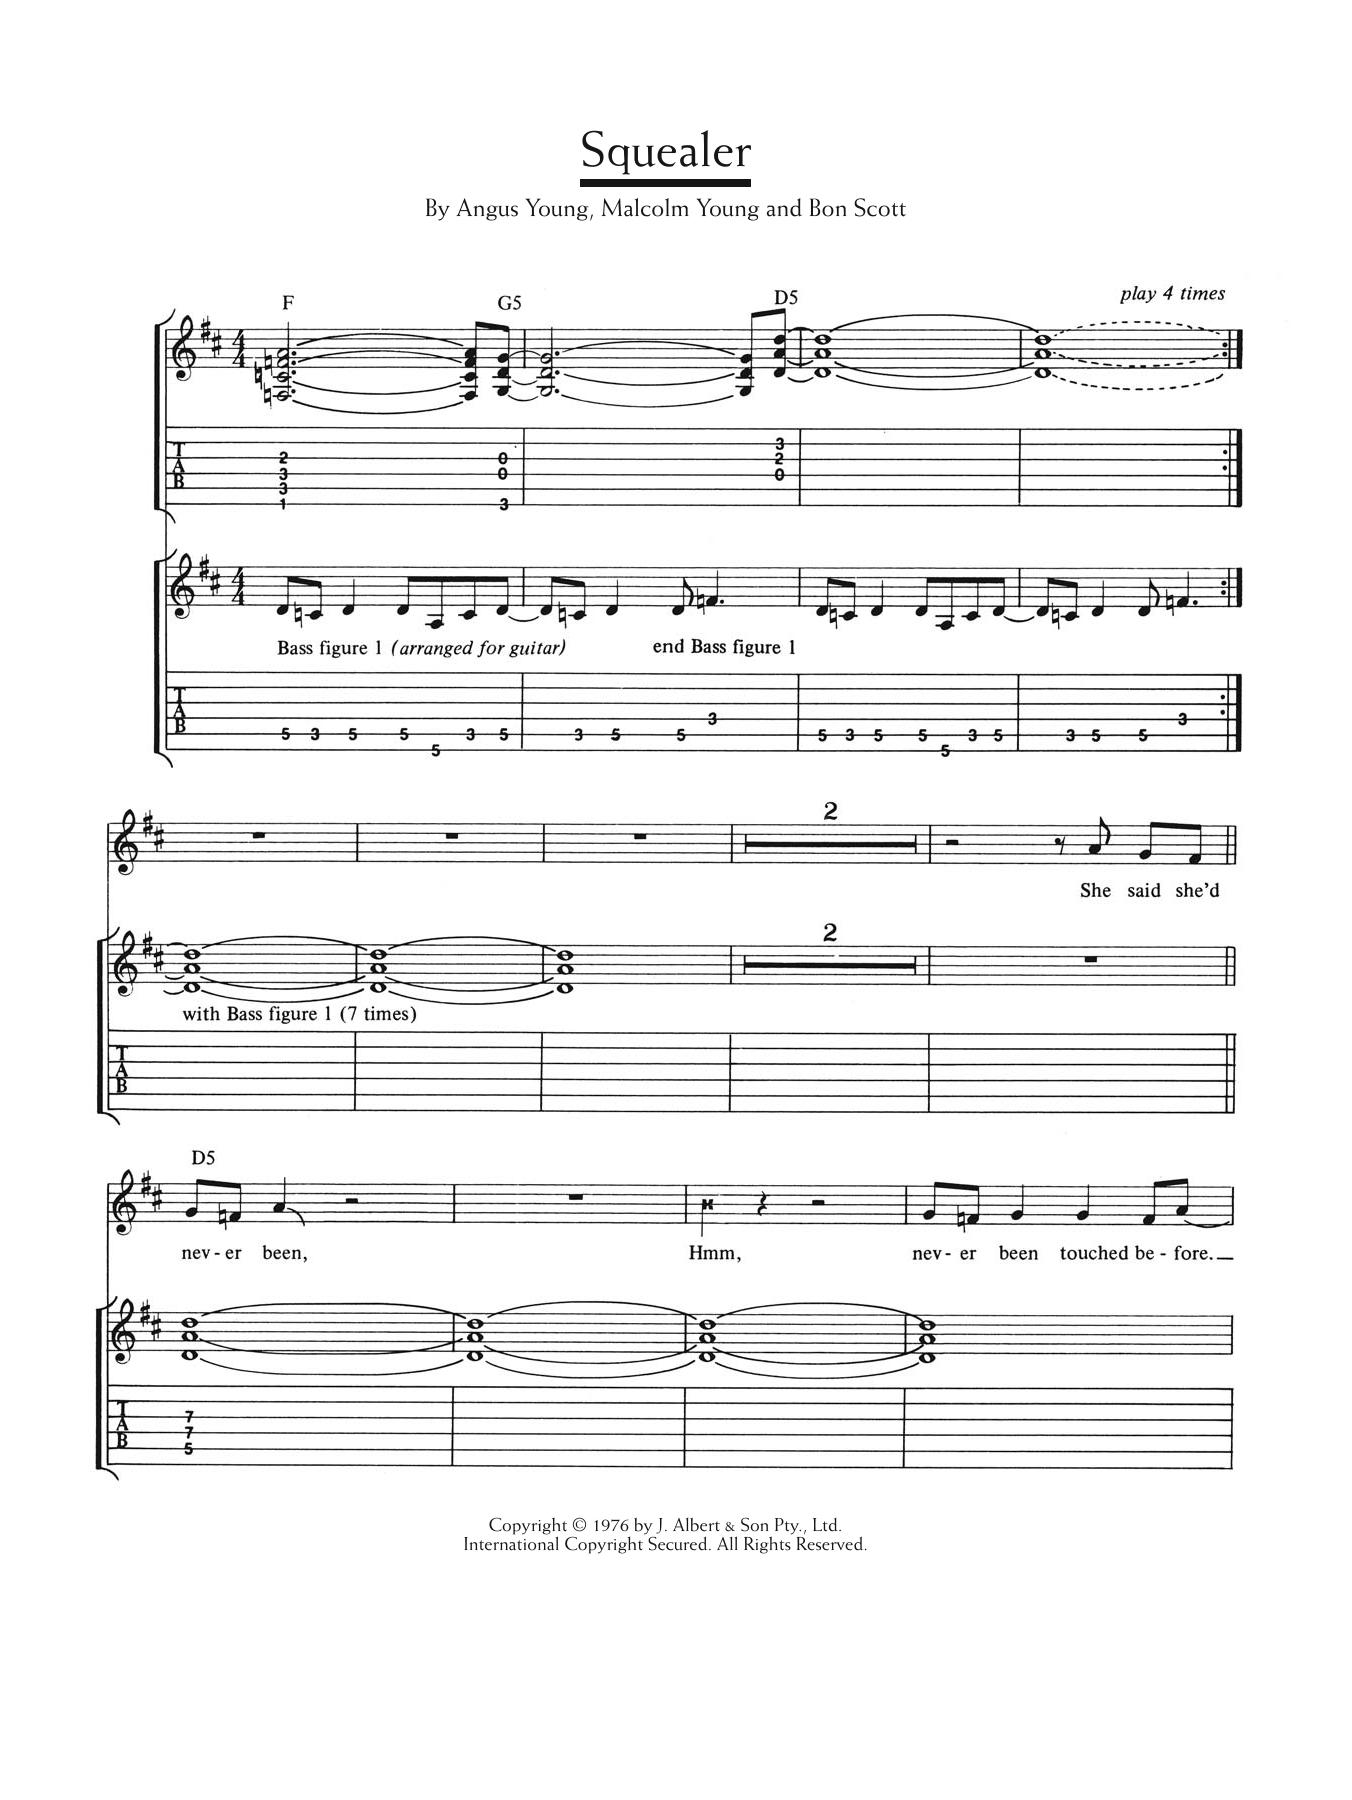 Squealer Sheet Music